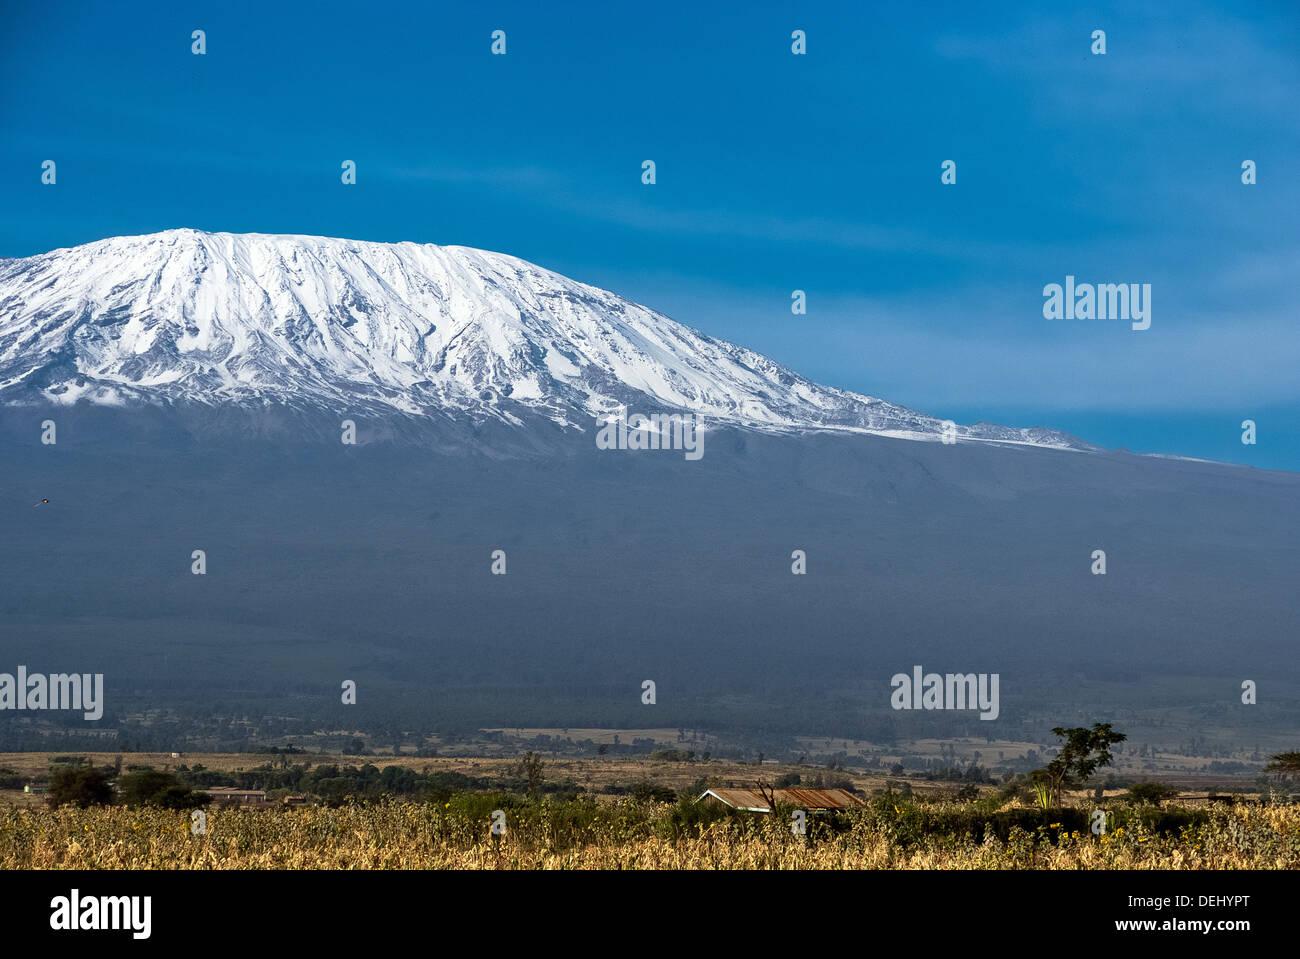 Kilimanjaro - Stock Image